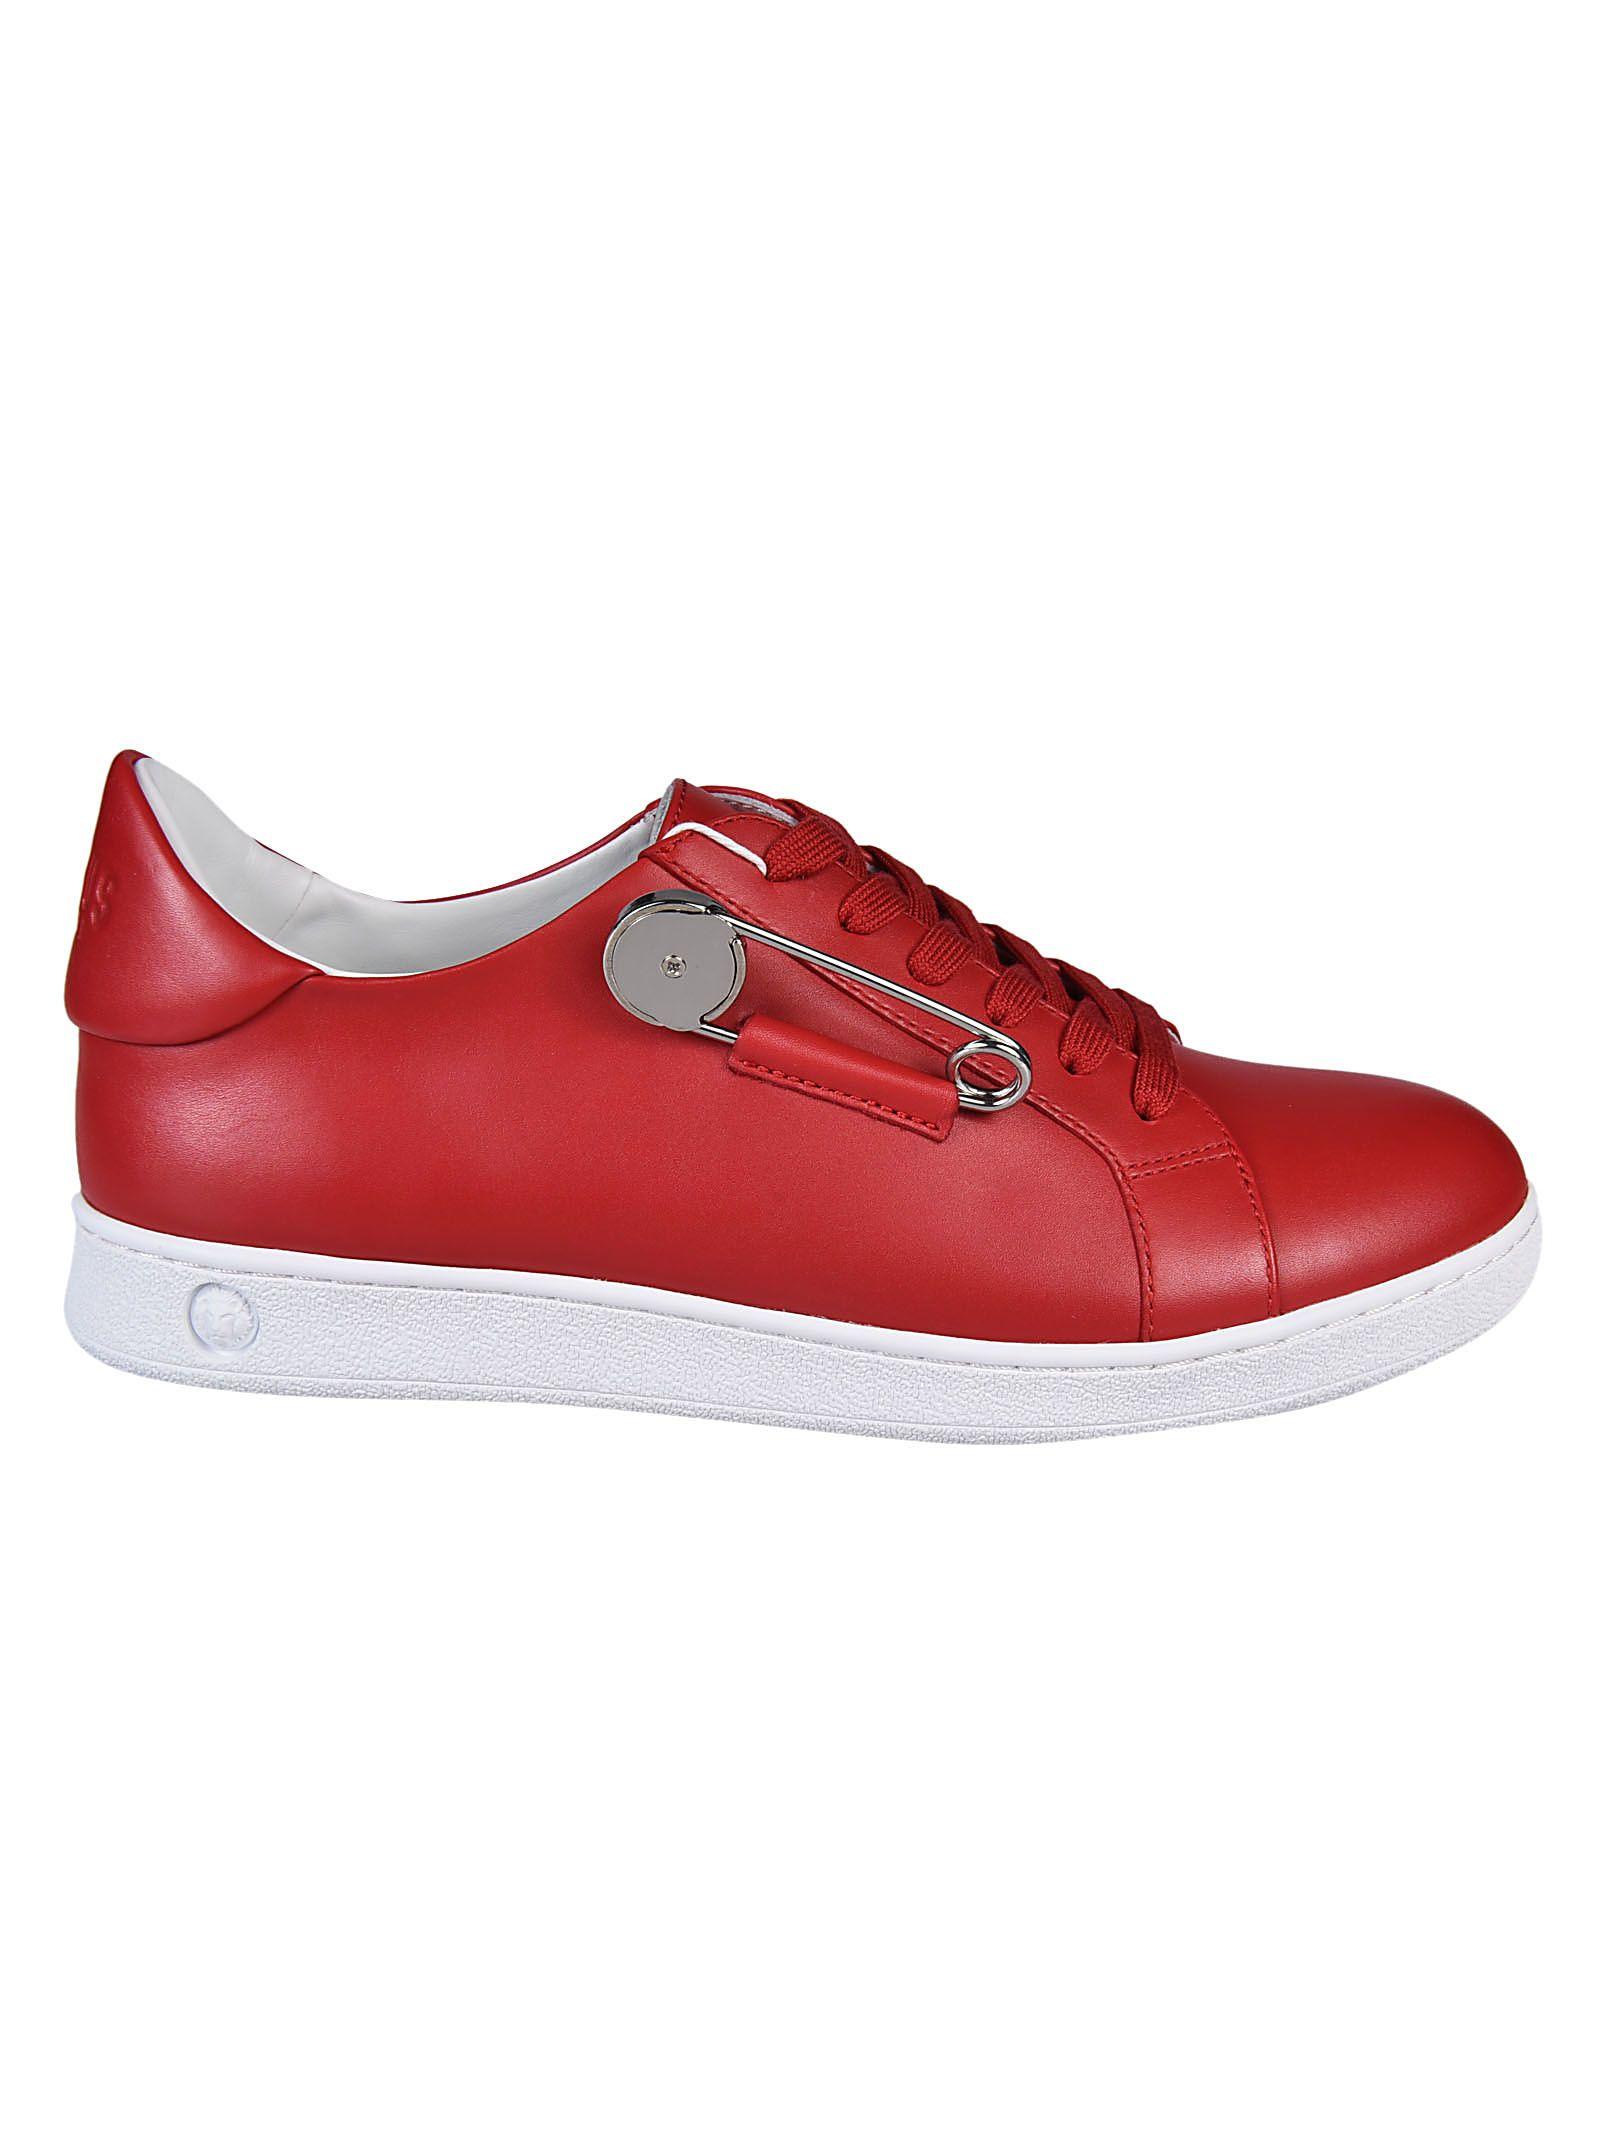 Versus Safety Pin Detail Sneakers